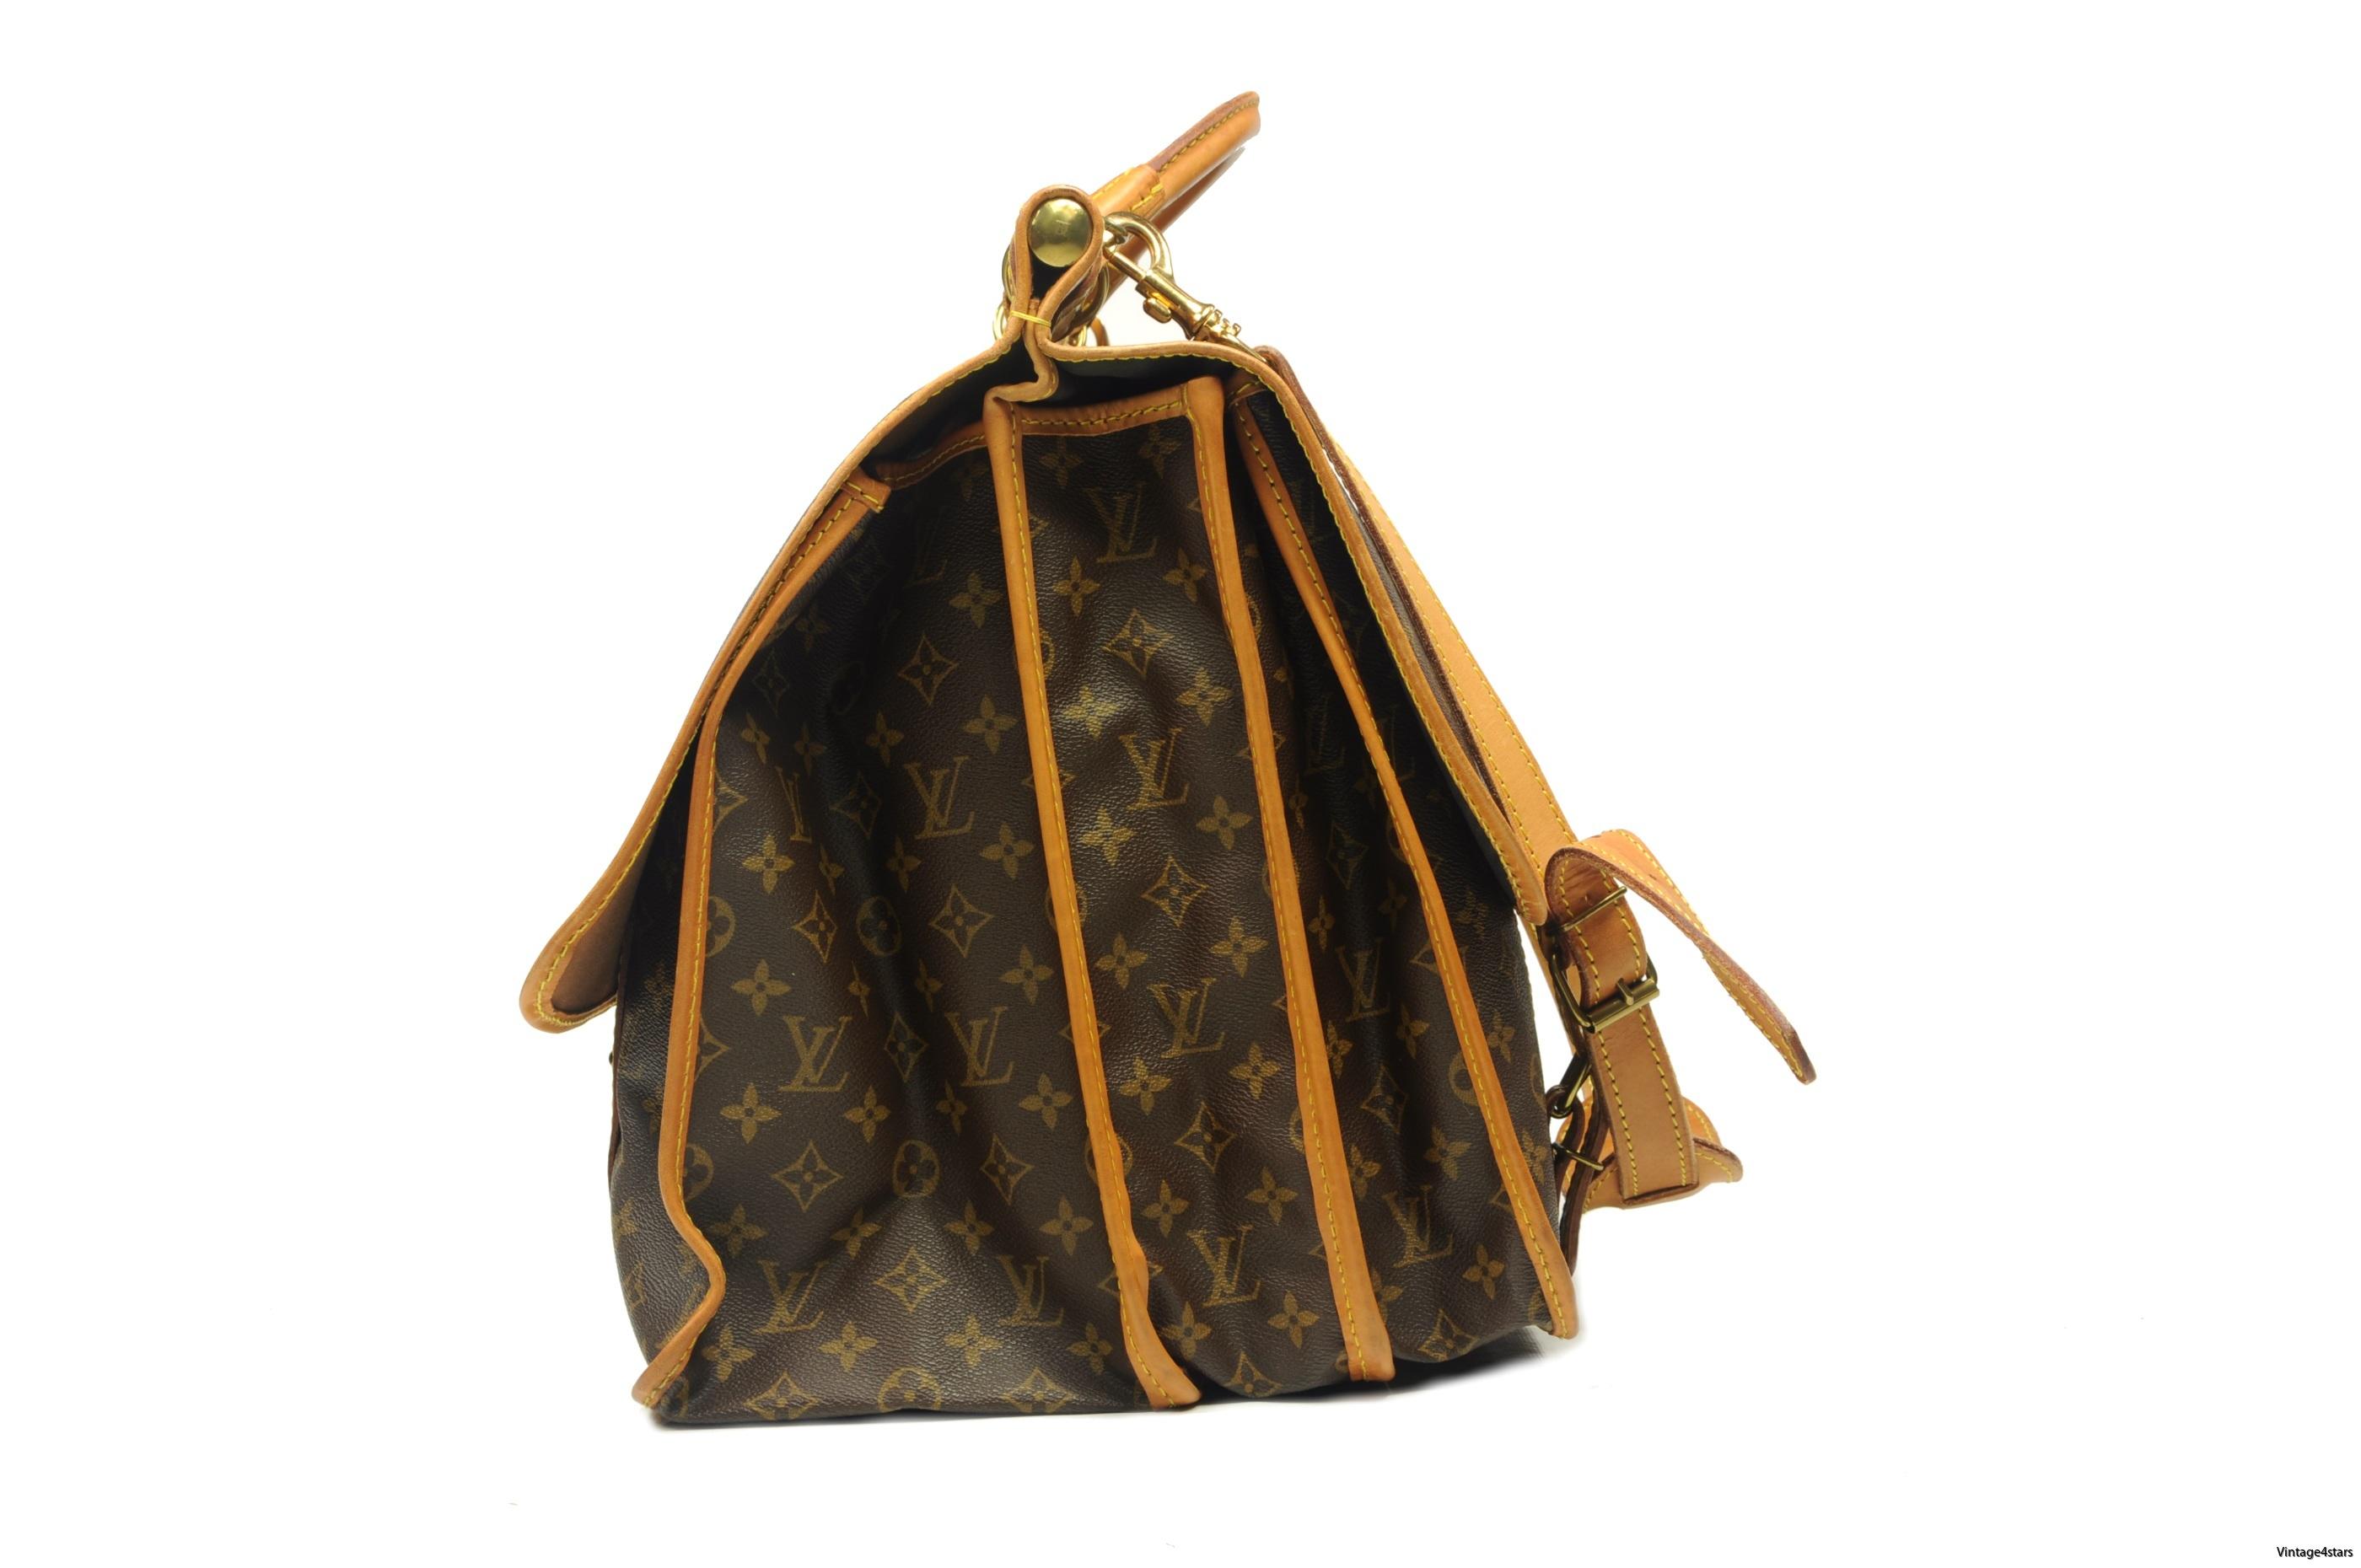 Louis Vuitton Sac Chasse Kleber 04